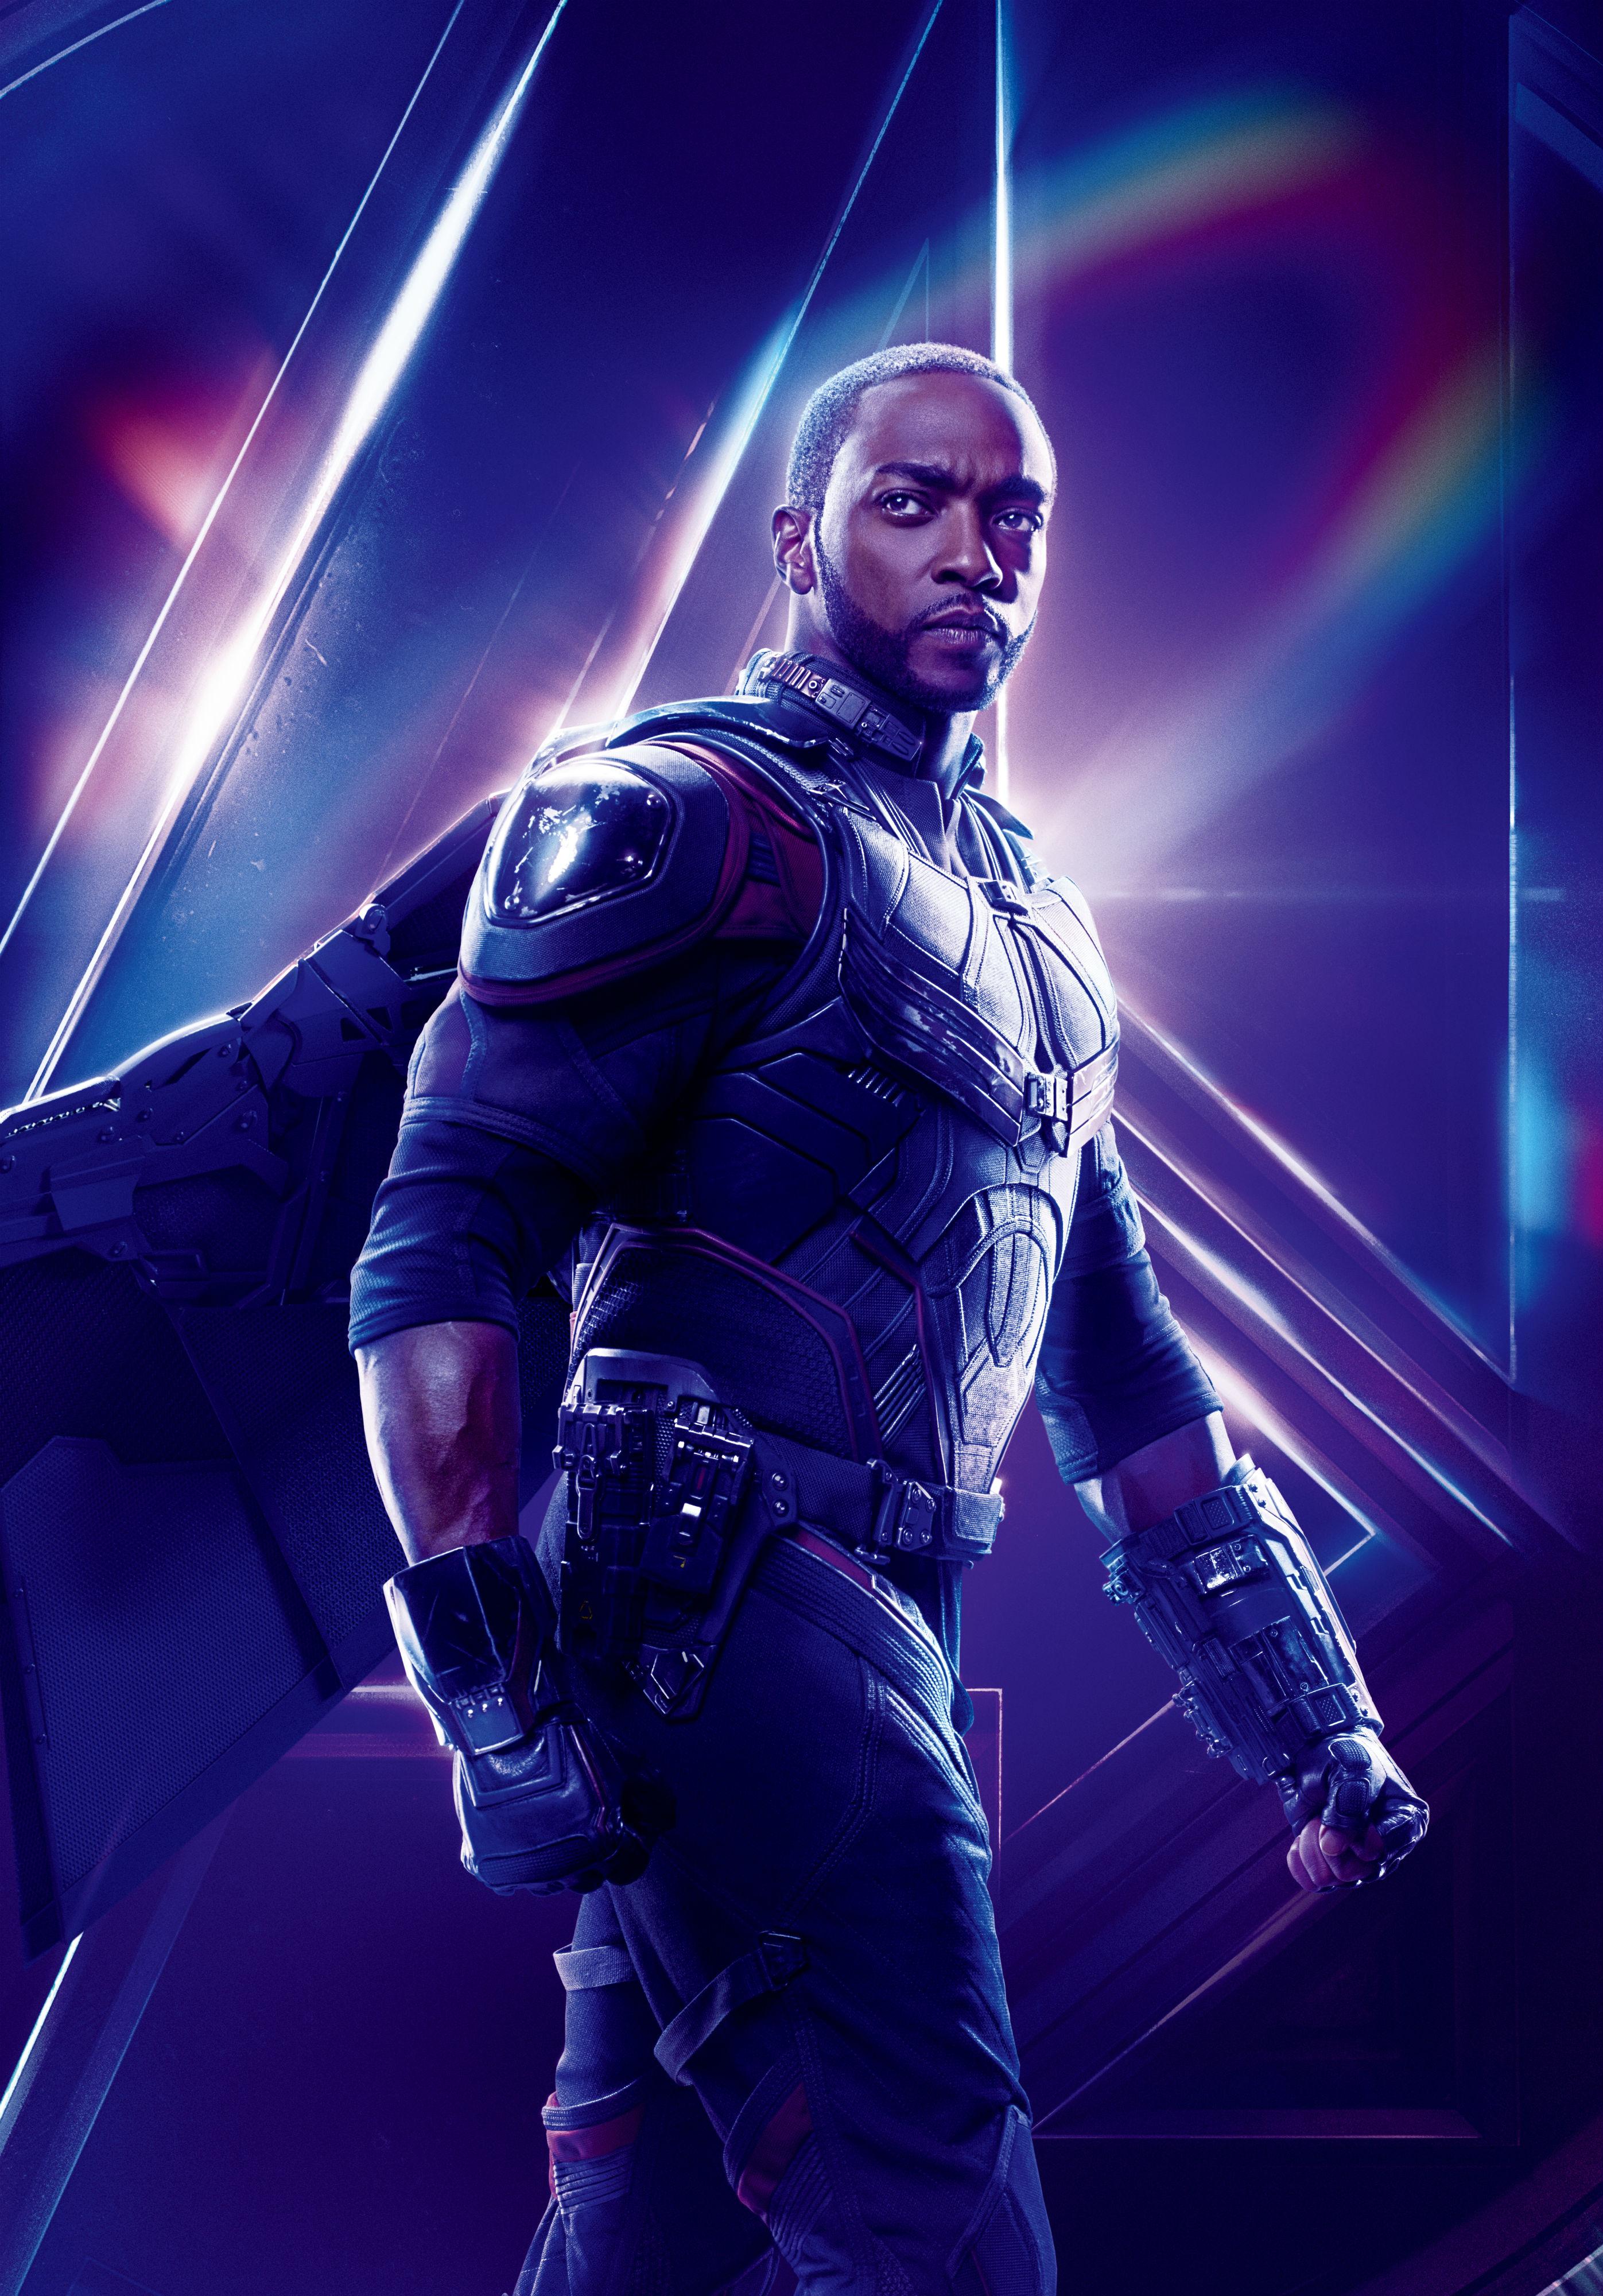 Falcon Marvel Cinematic Universe Wiki FANDOM powered